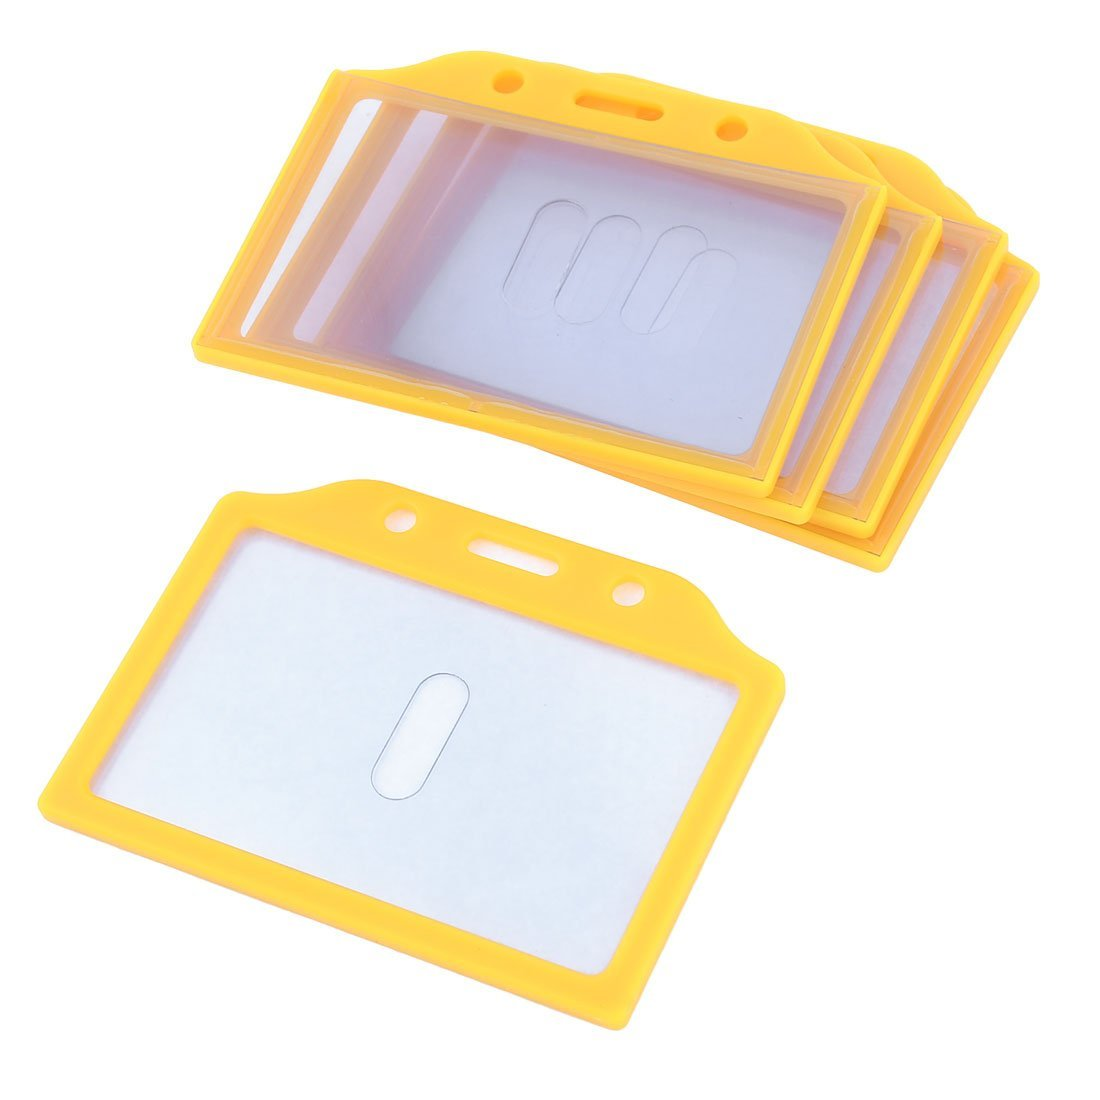 Uxcell Plastic Frame School Slide ID Card Holder, 85 x 52mm, 5-Piece, Yellow